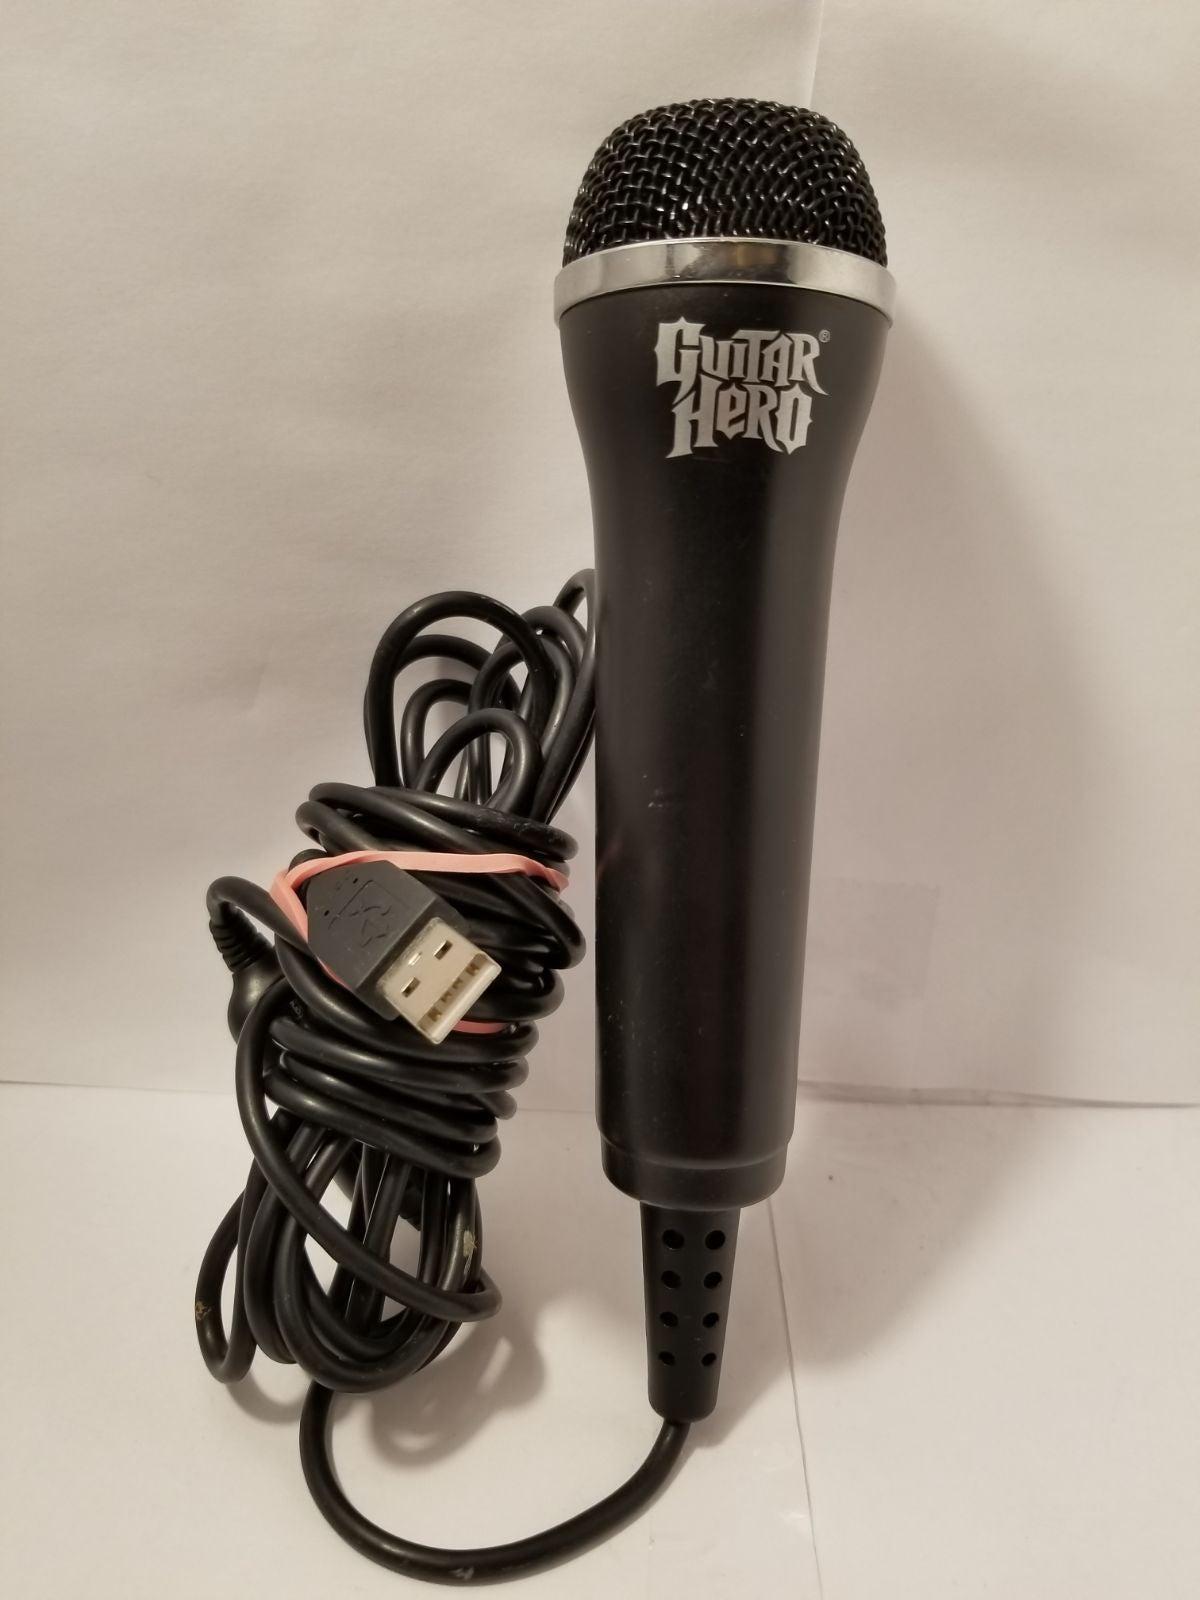 Guitar Hero Microphone usb